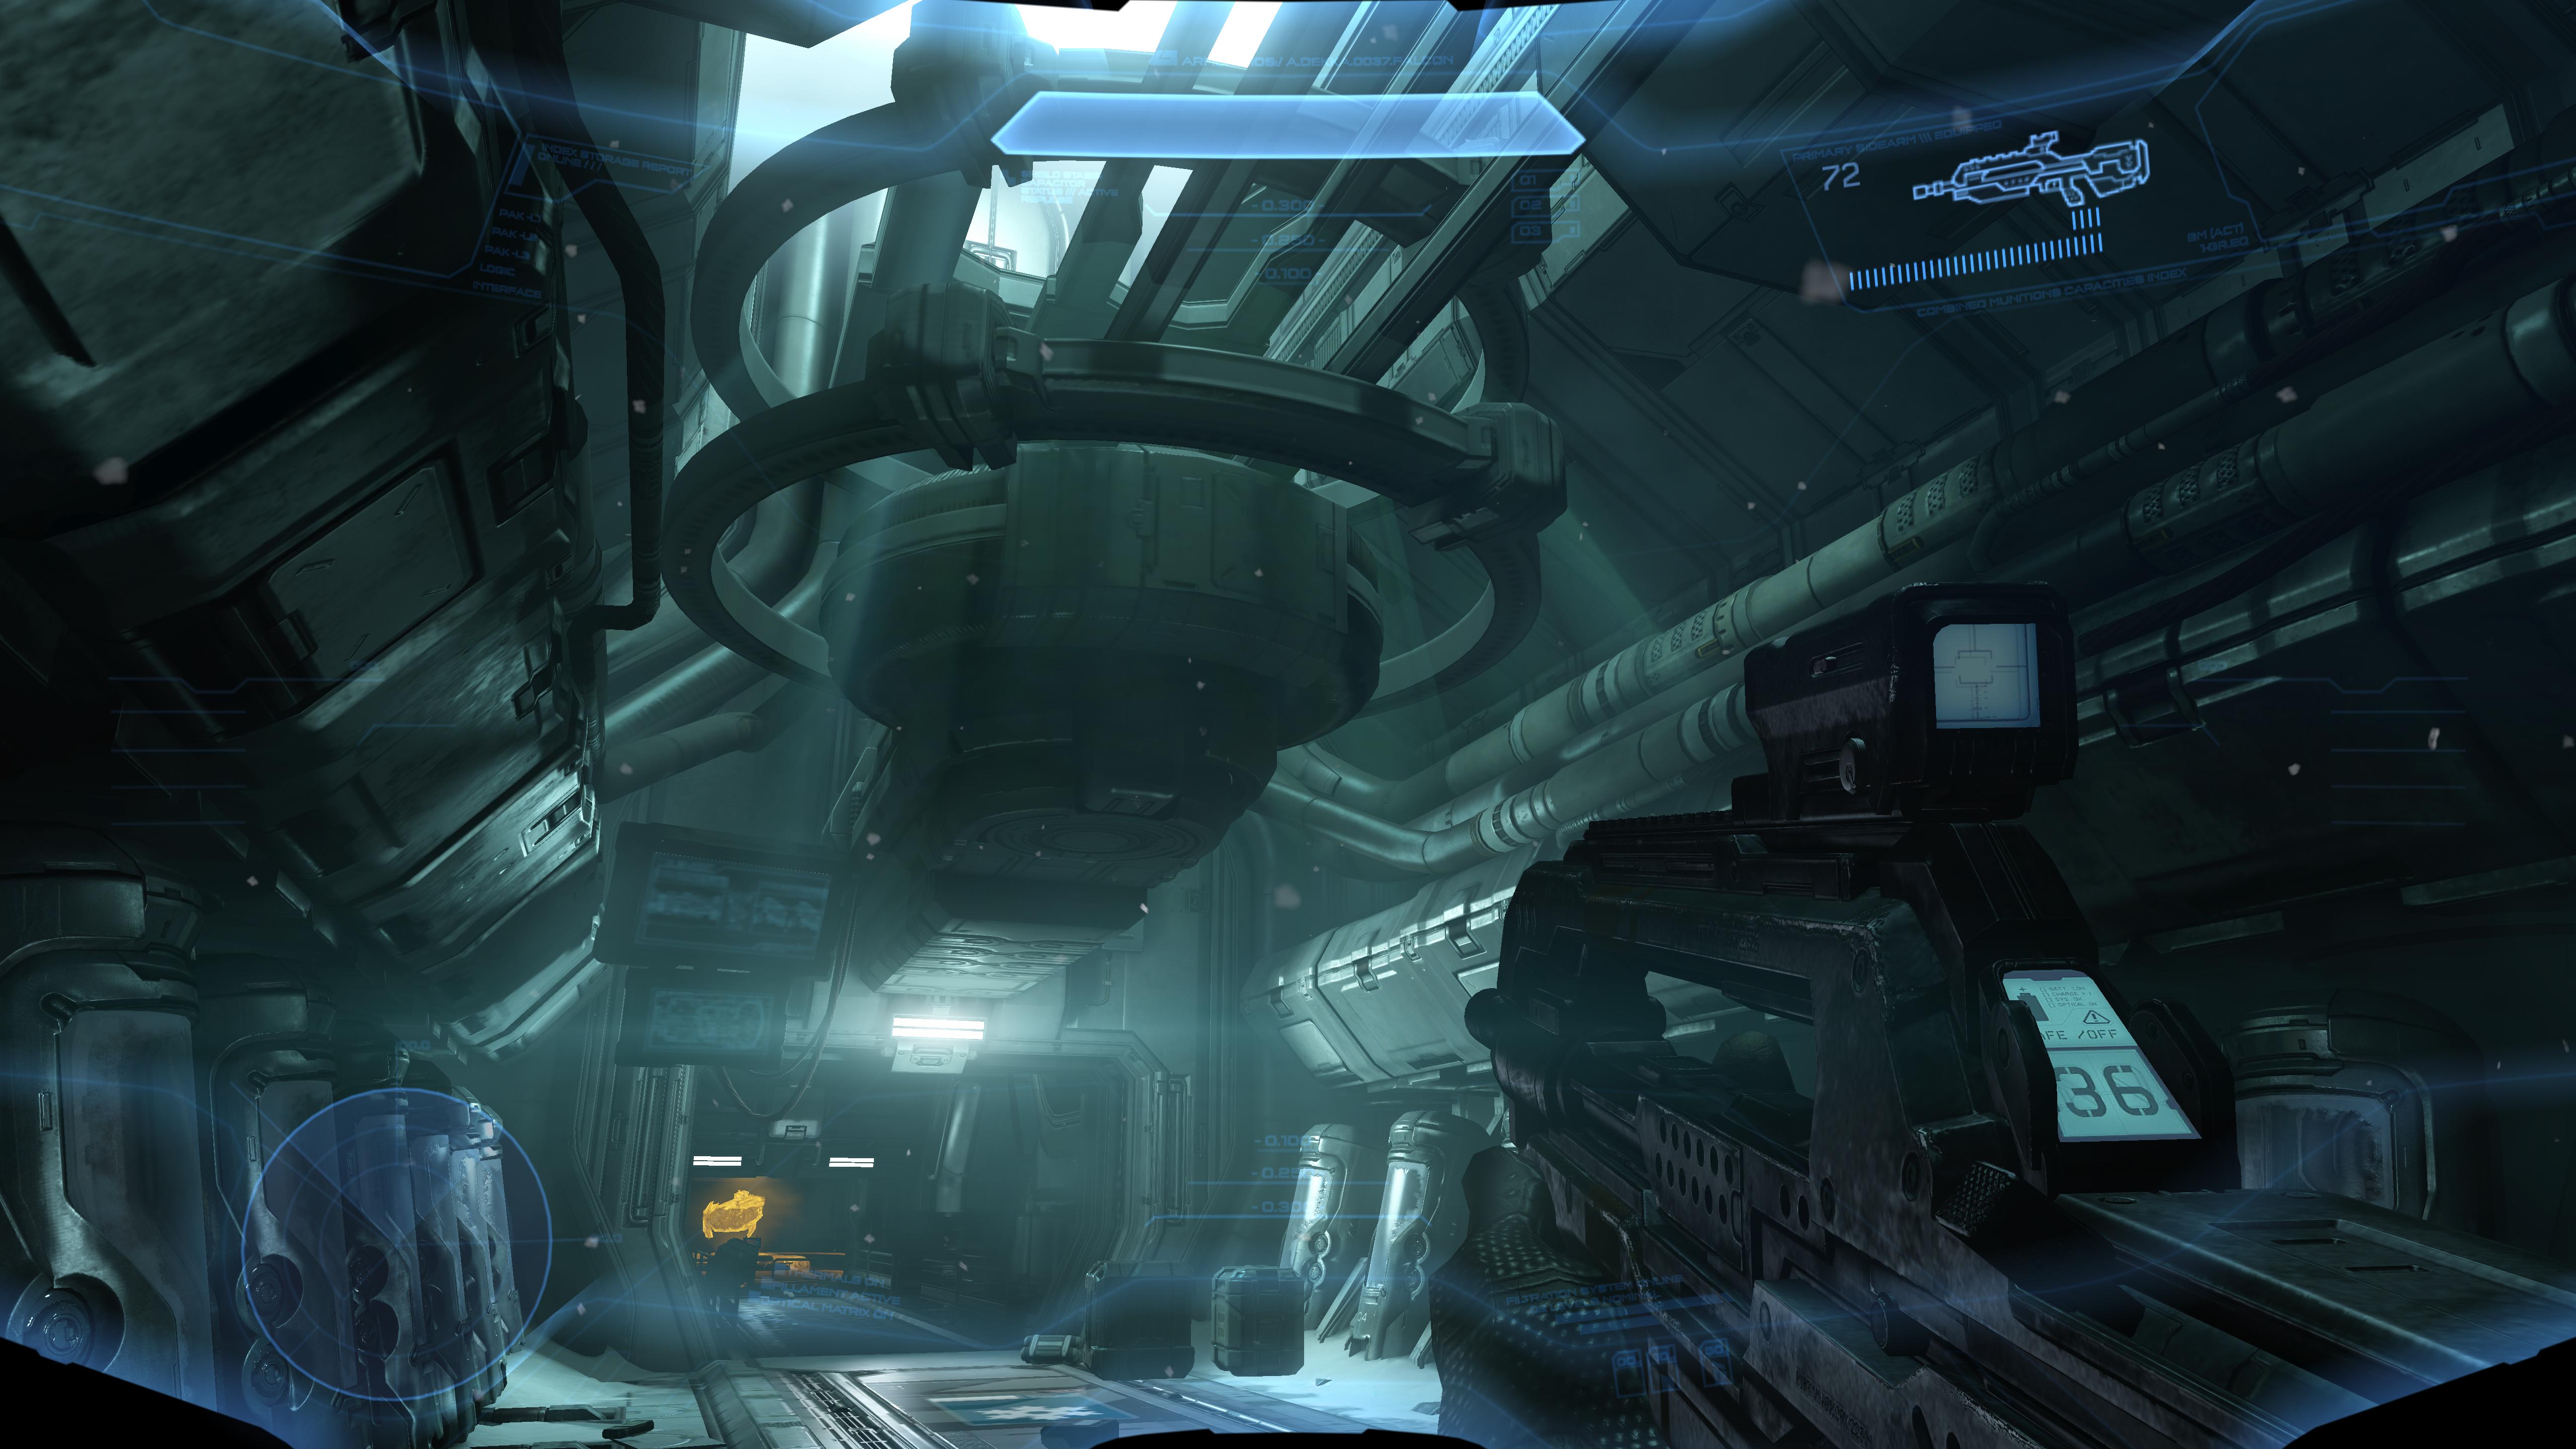 Halo4_campaign-02.jpg